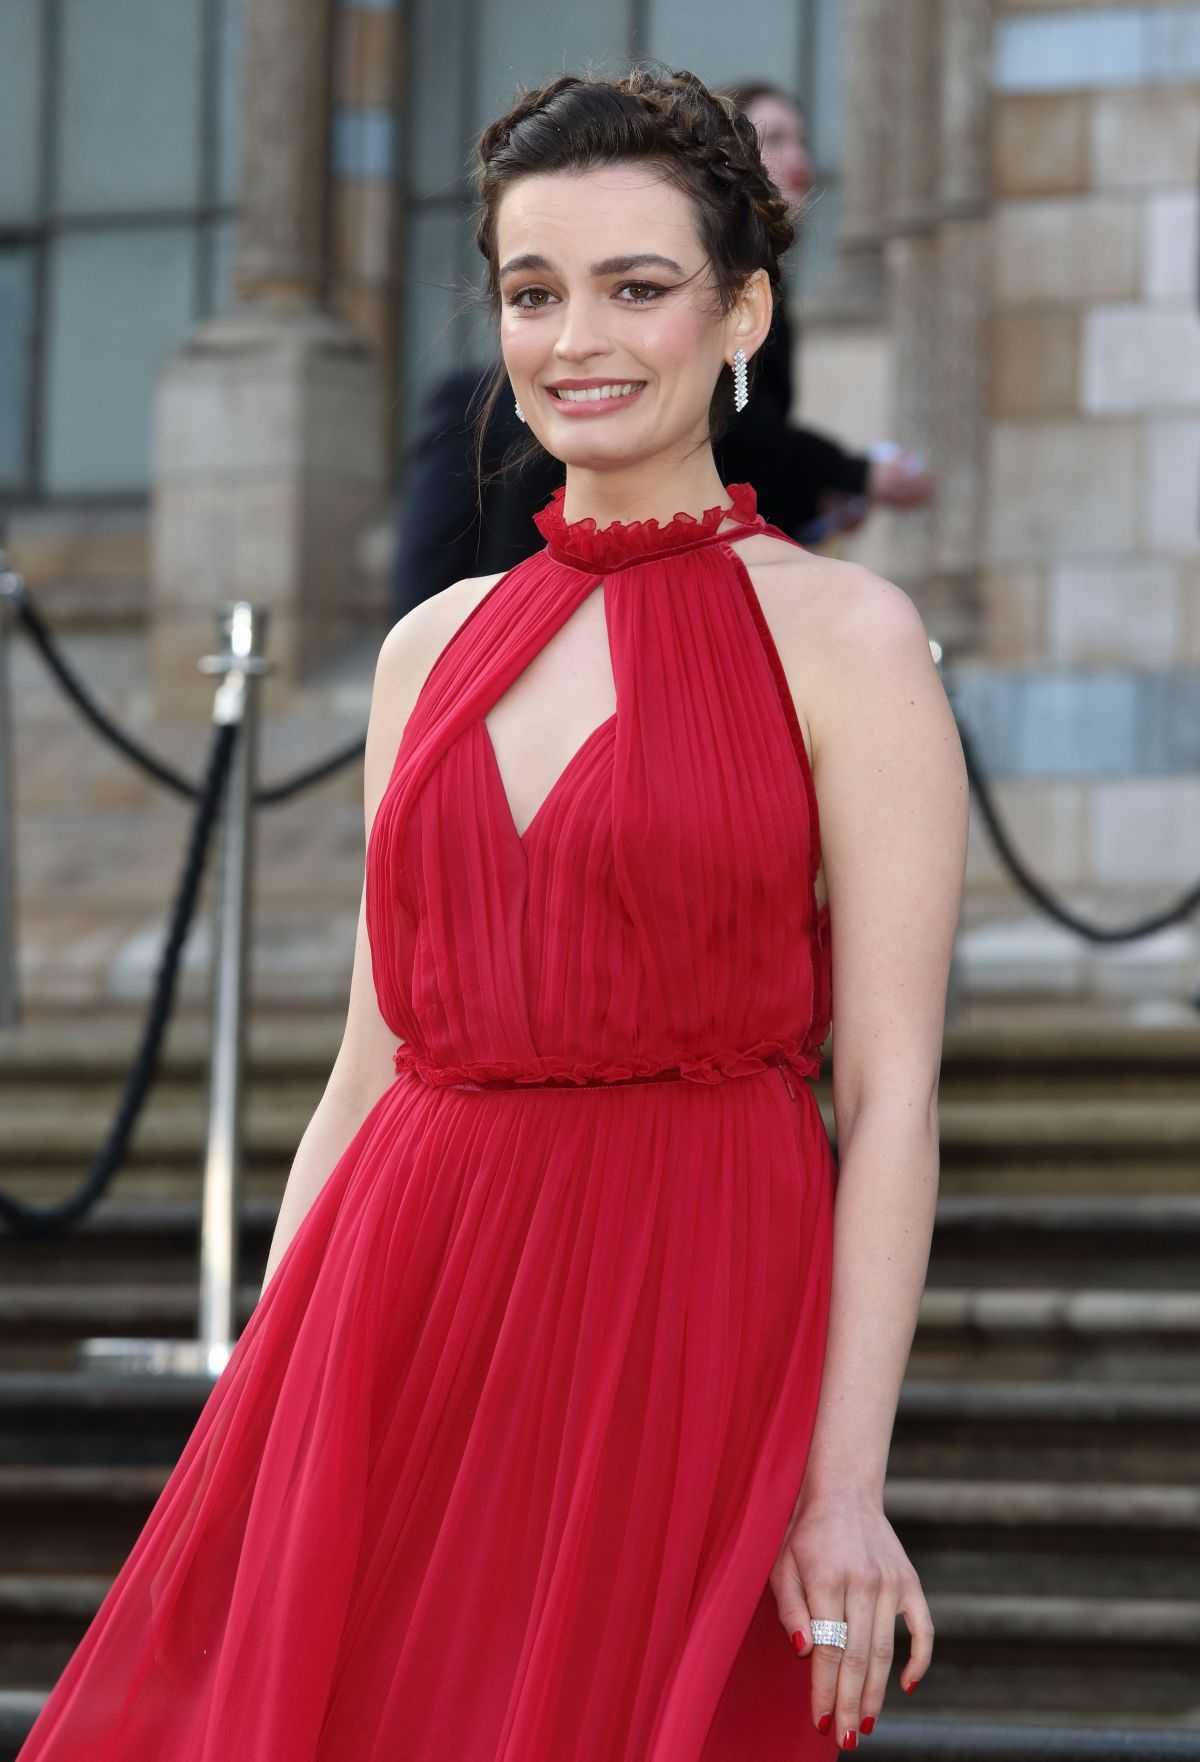 Emma Mackey hot red dress pic